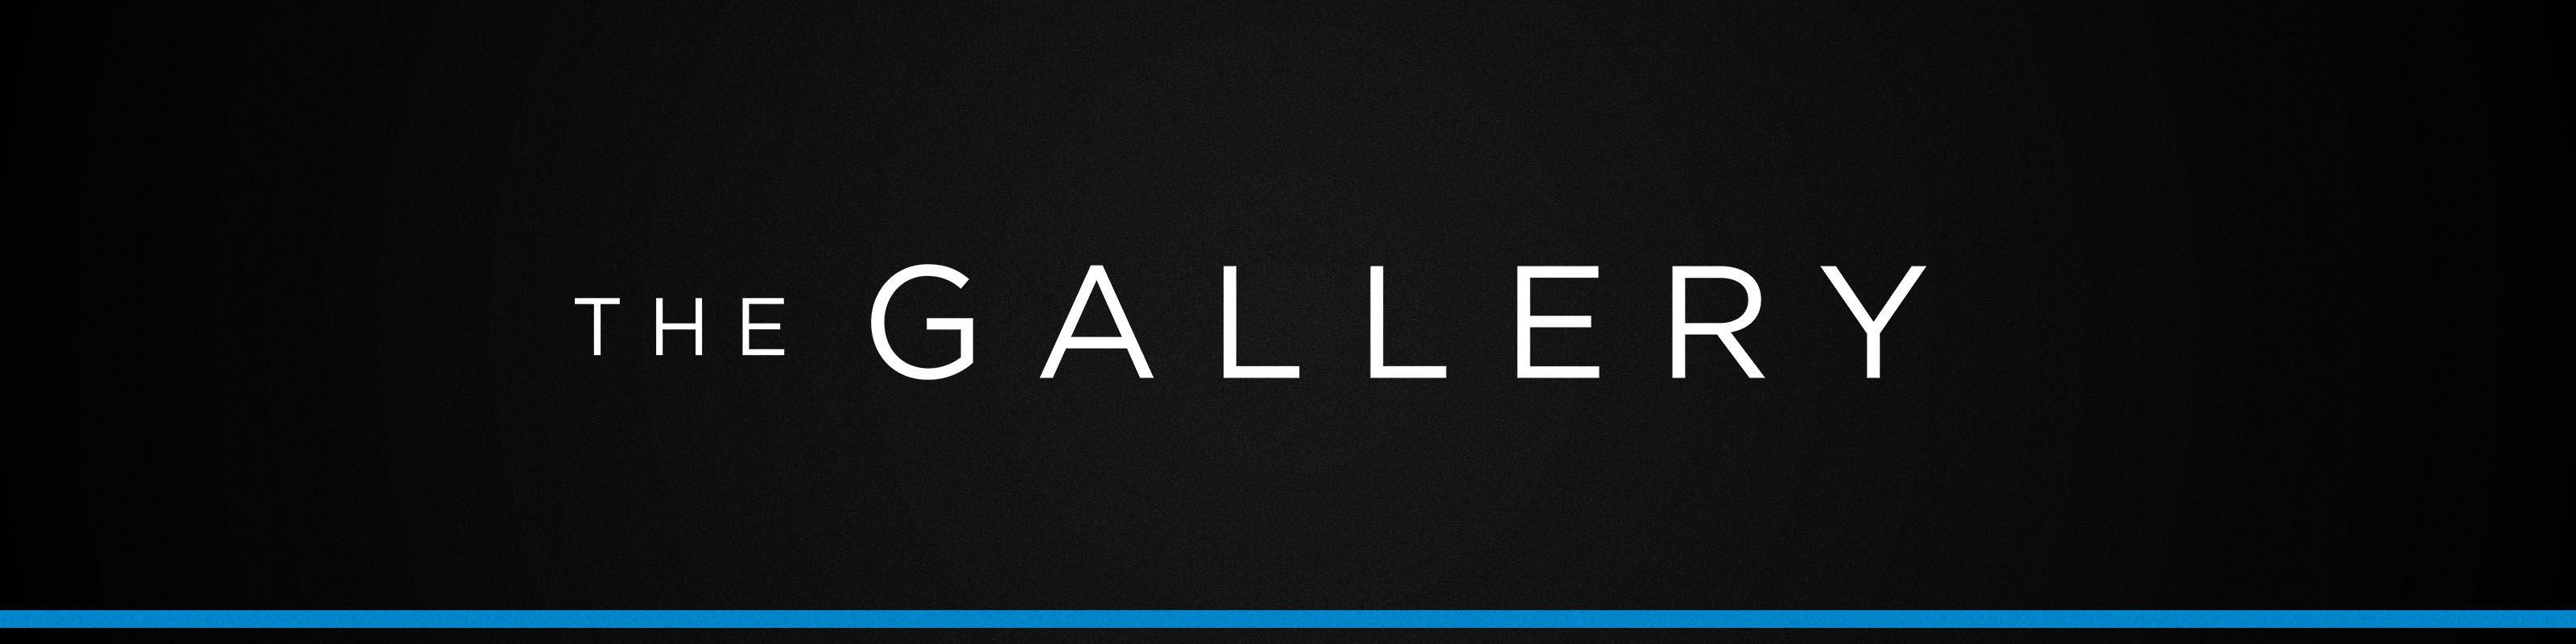 GallerySuites_FinalBL1